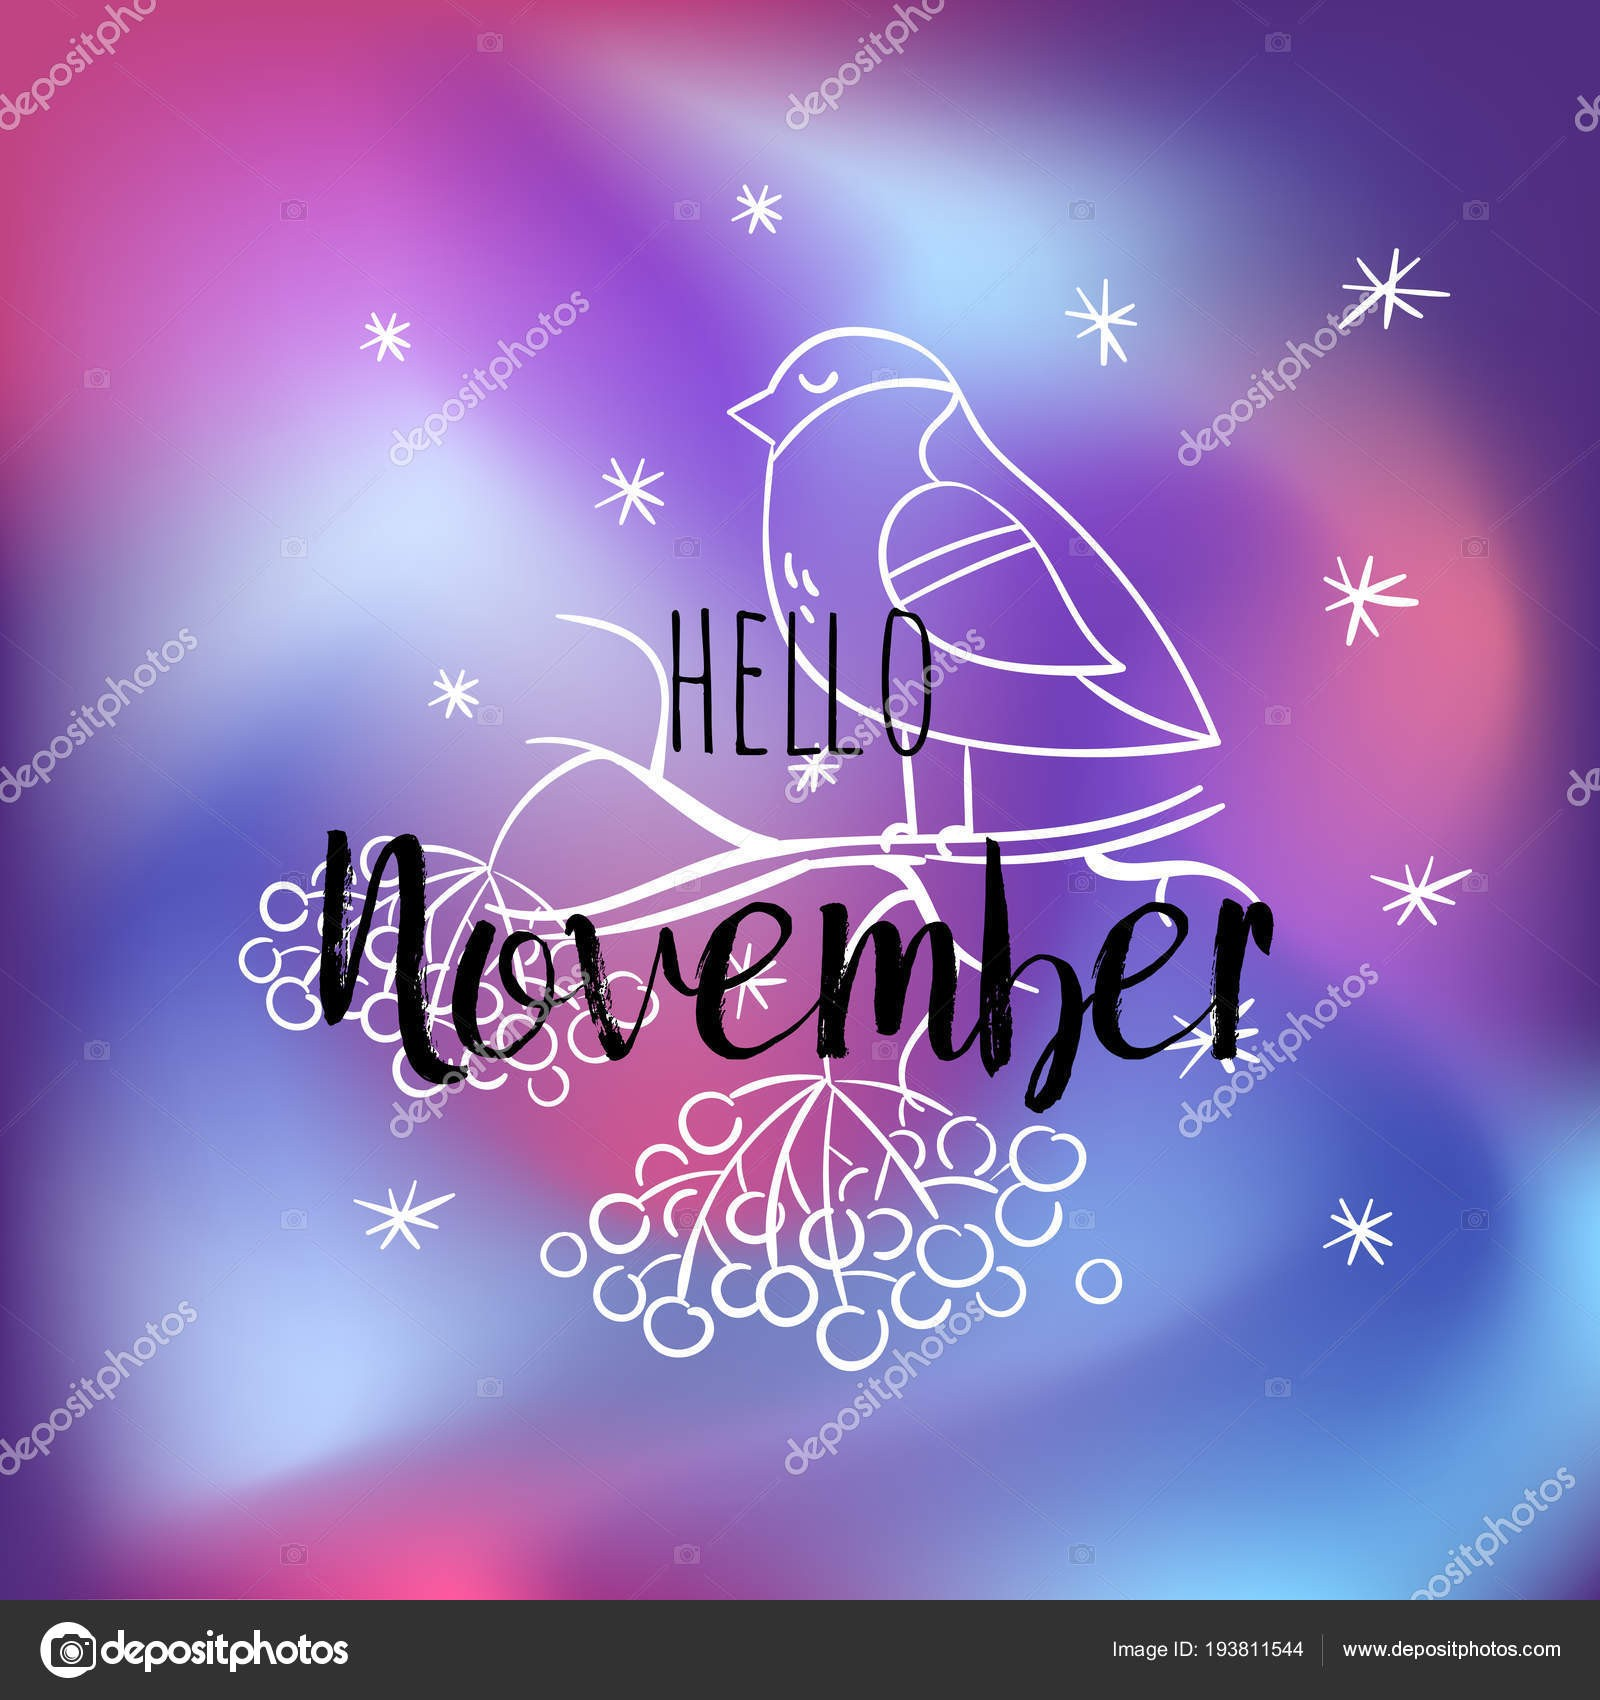 Calendário Para Imprimir Ano 2019 Más Recientes Calendario Novembro 2018 Imprimir T